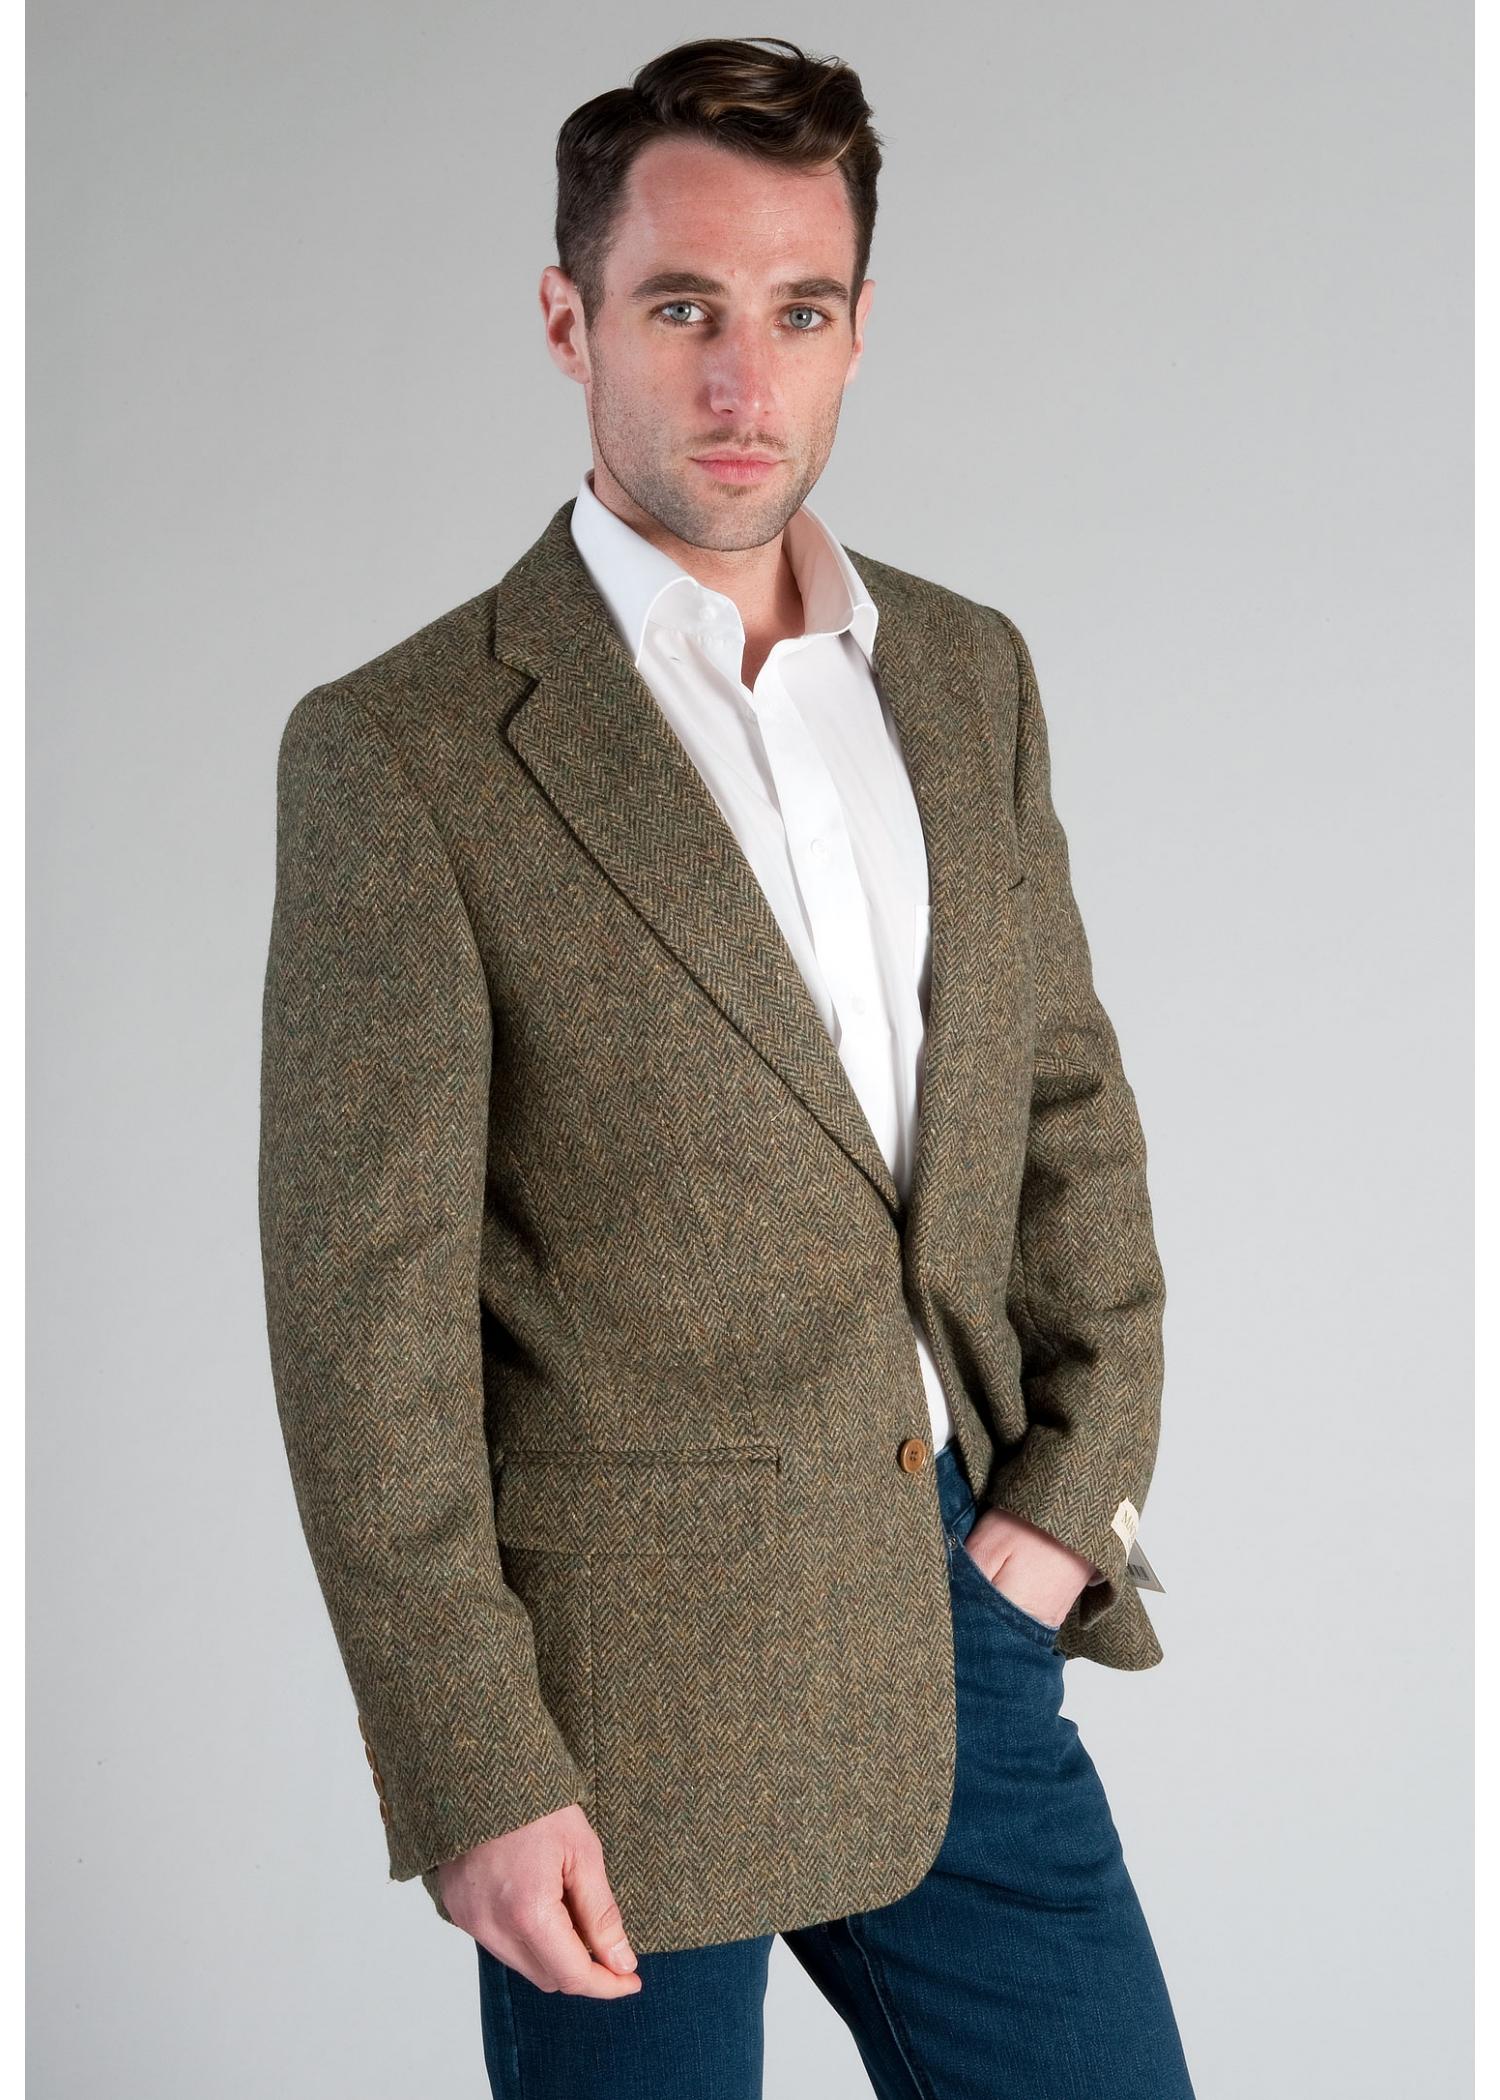 How to Wear Tweed Jackets – careyfashion.com